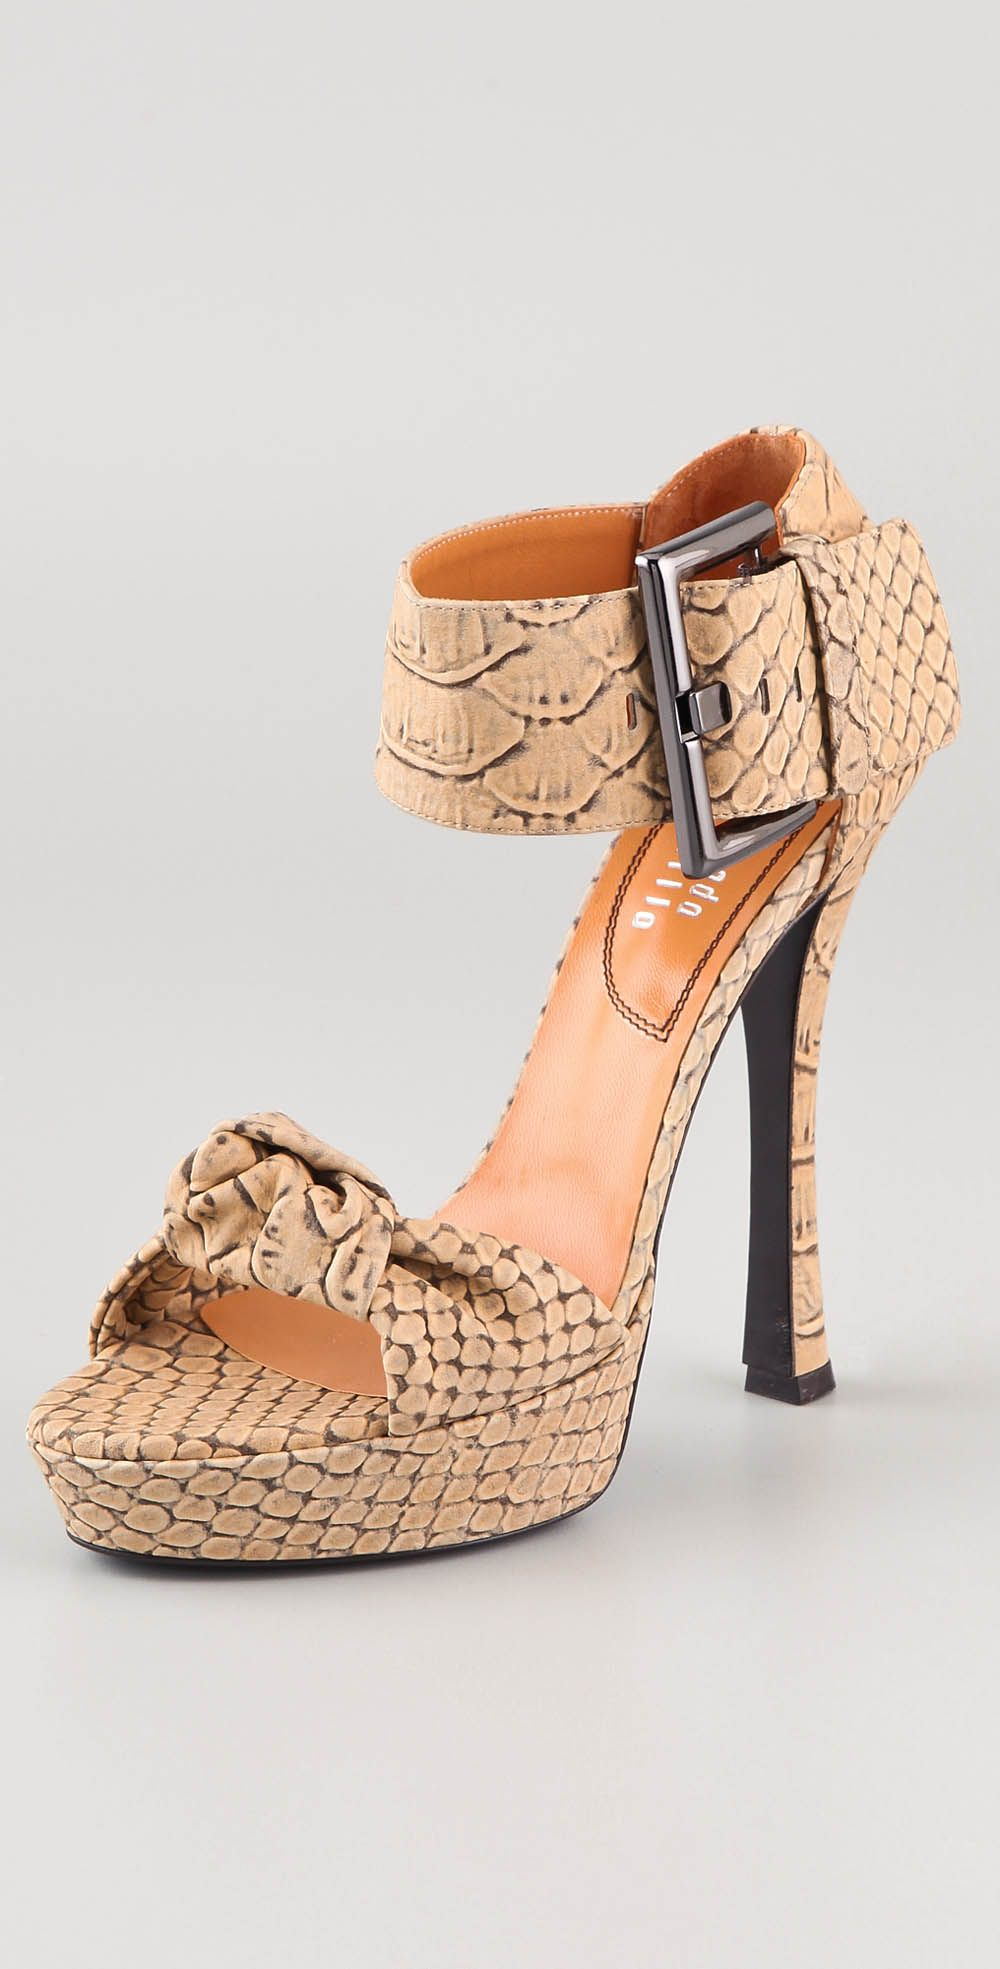 Edmundo Castillo Python Platform Sandals cheap hot sale 5DJpEUWZbM